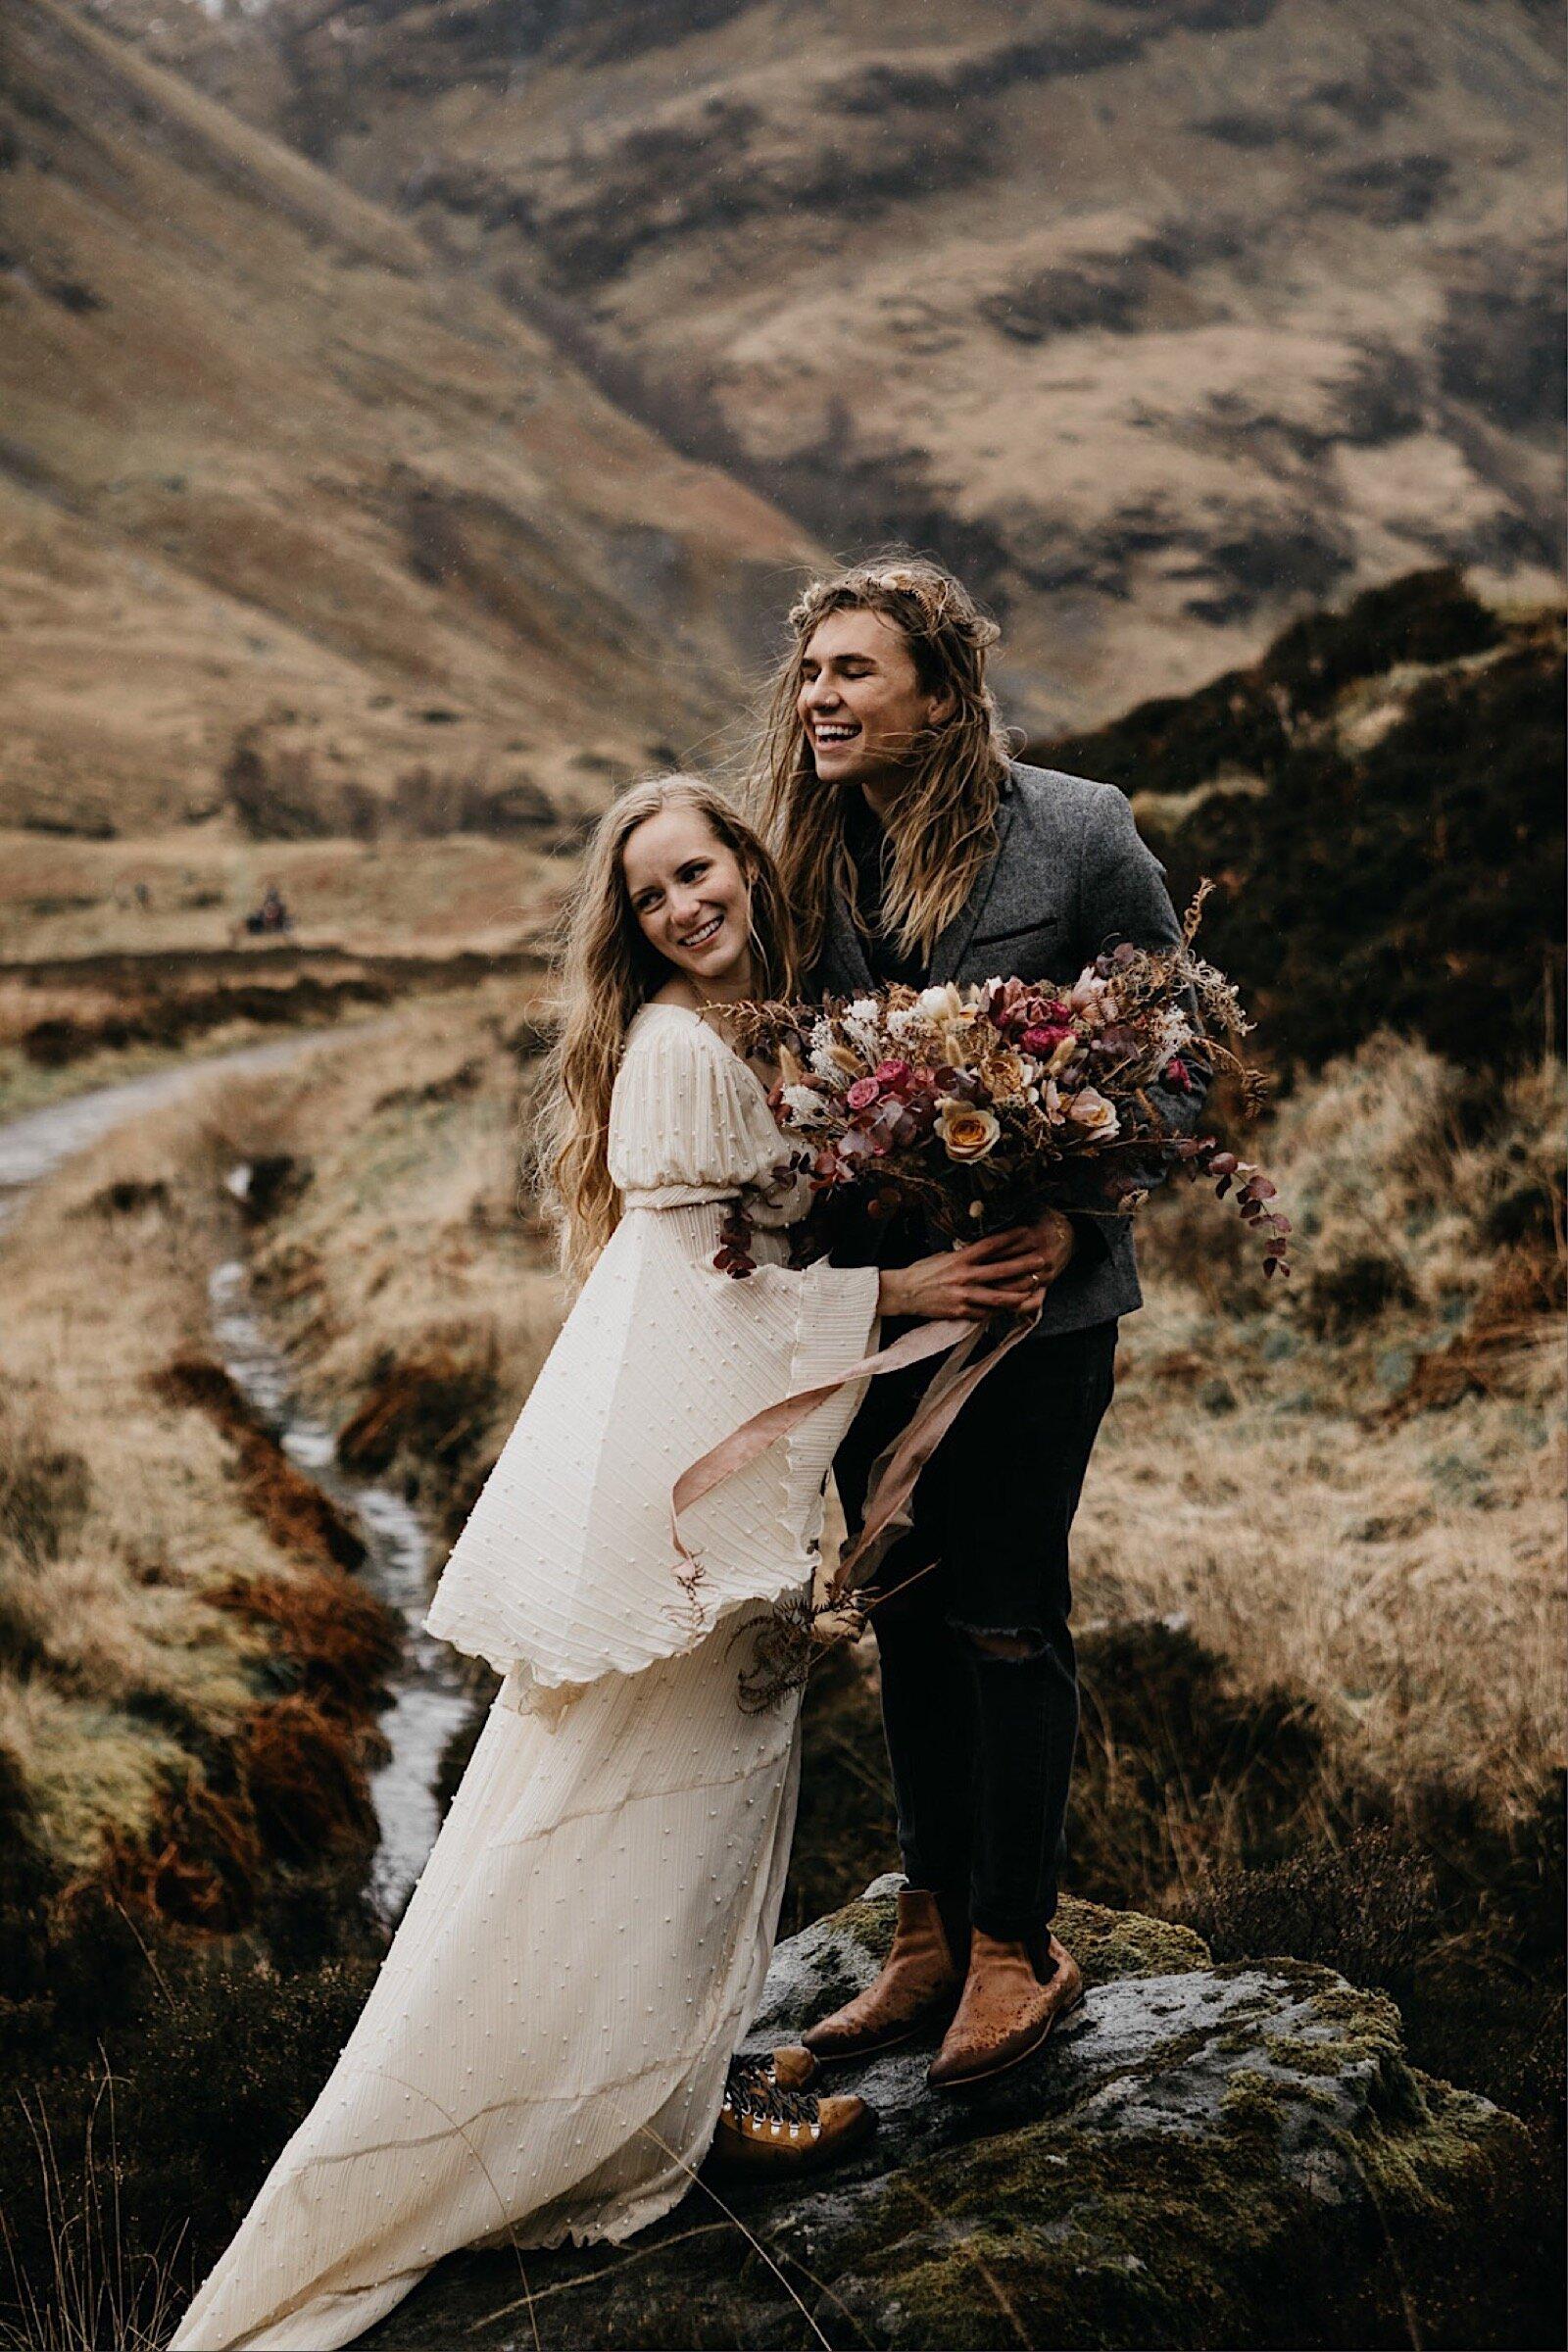 20_scotland_couple_shoot_lety_photography (27 von 39).jpg